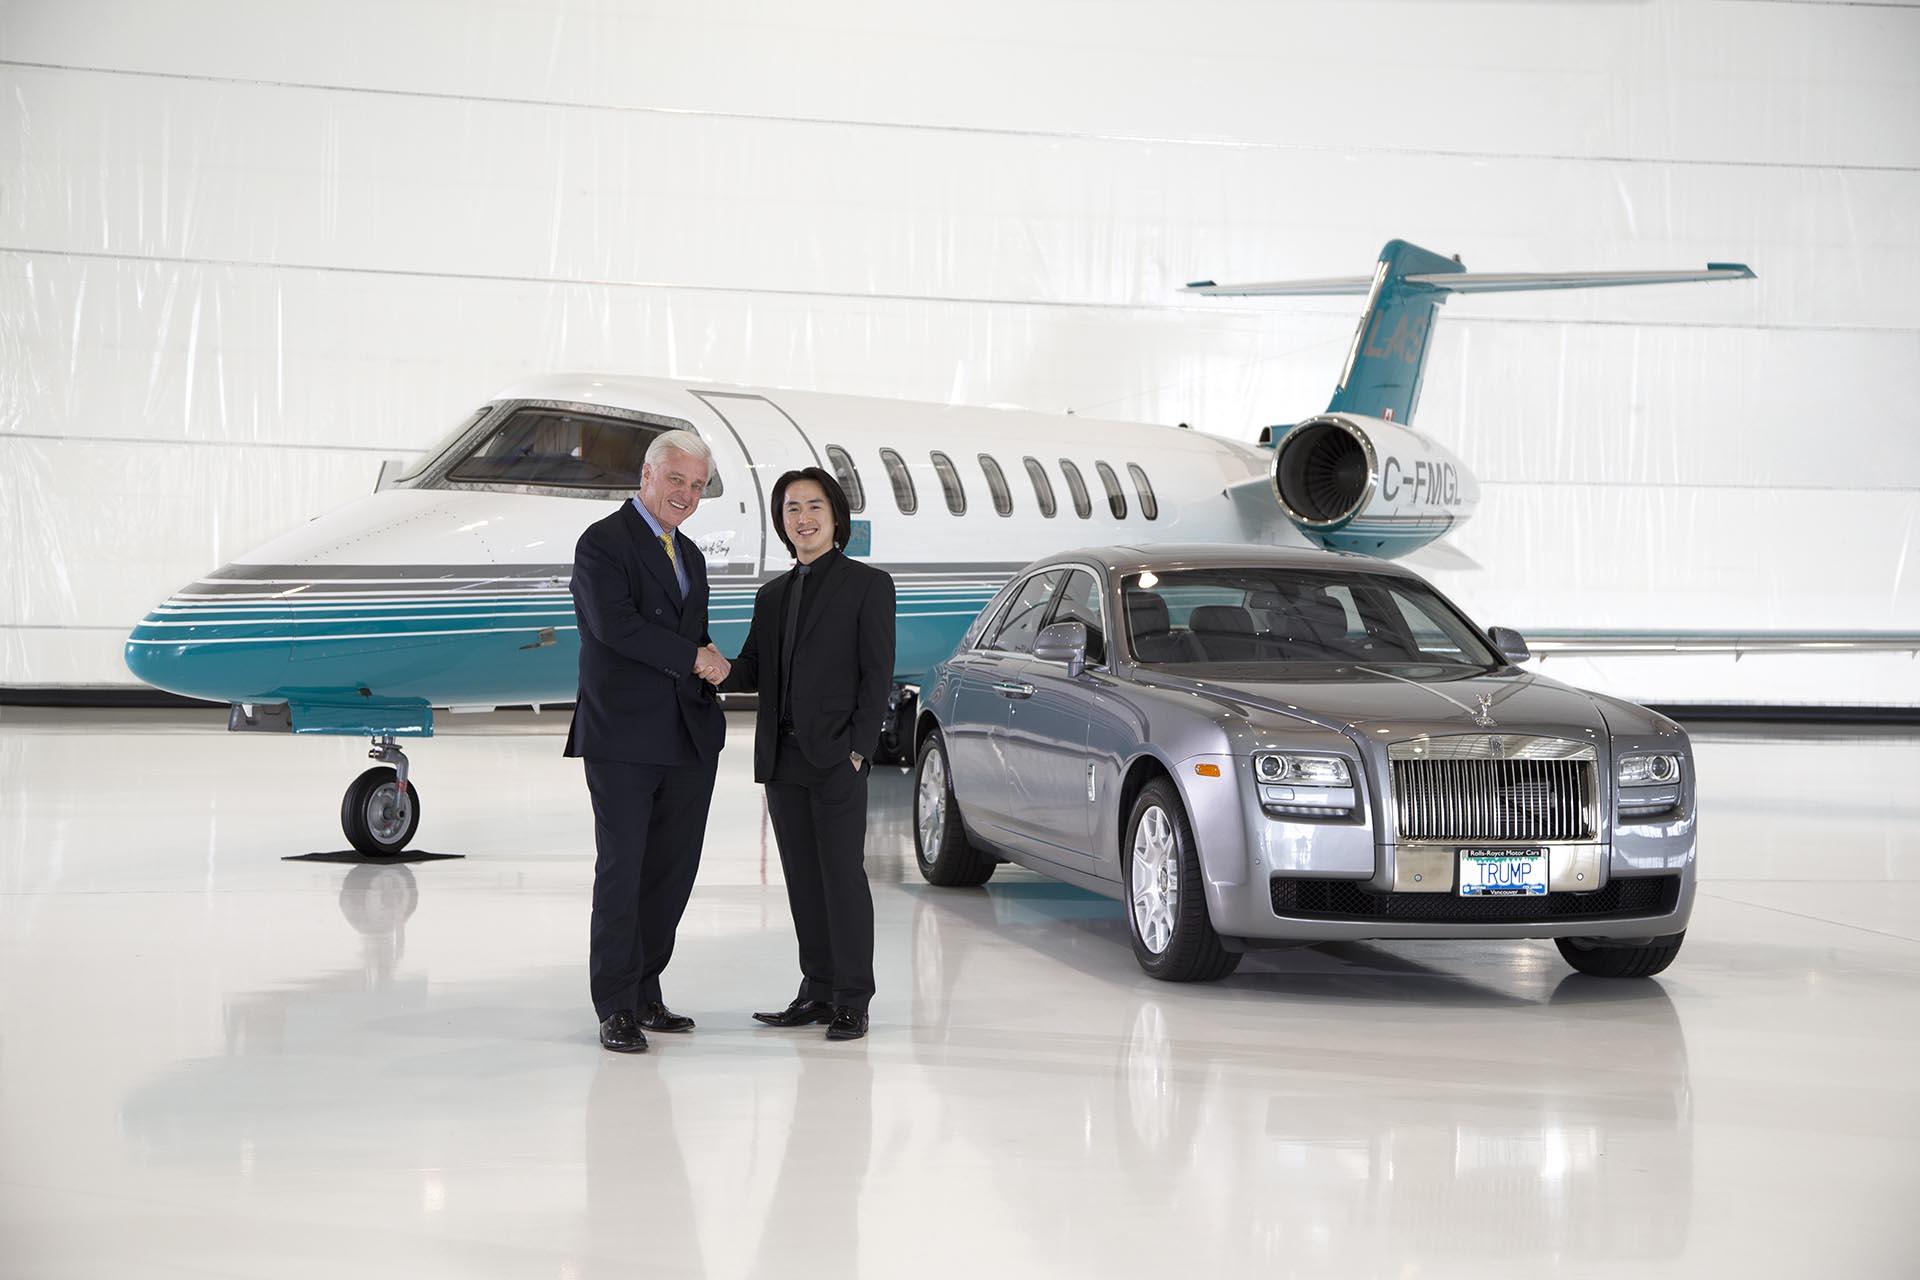 A Partnership: LAS, Rolls-Royce & TIHT Vancouver